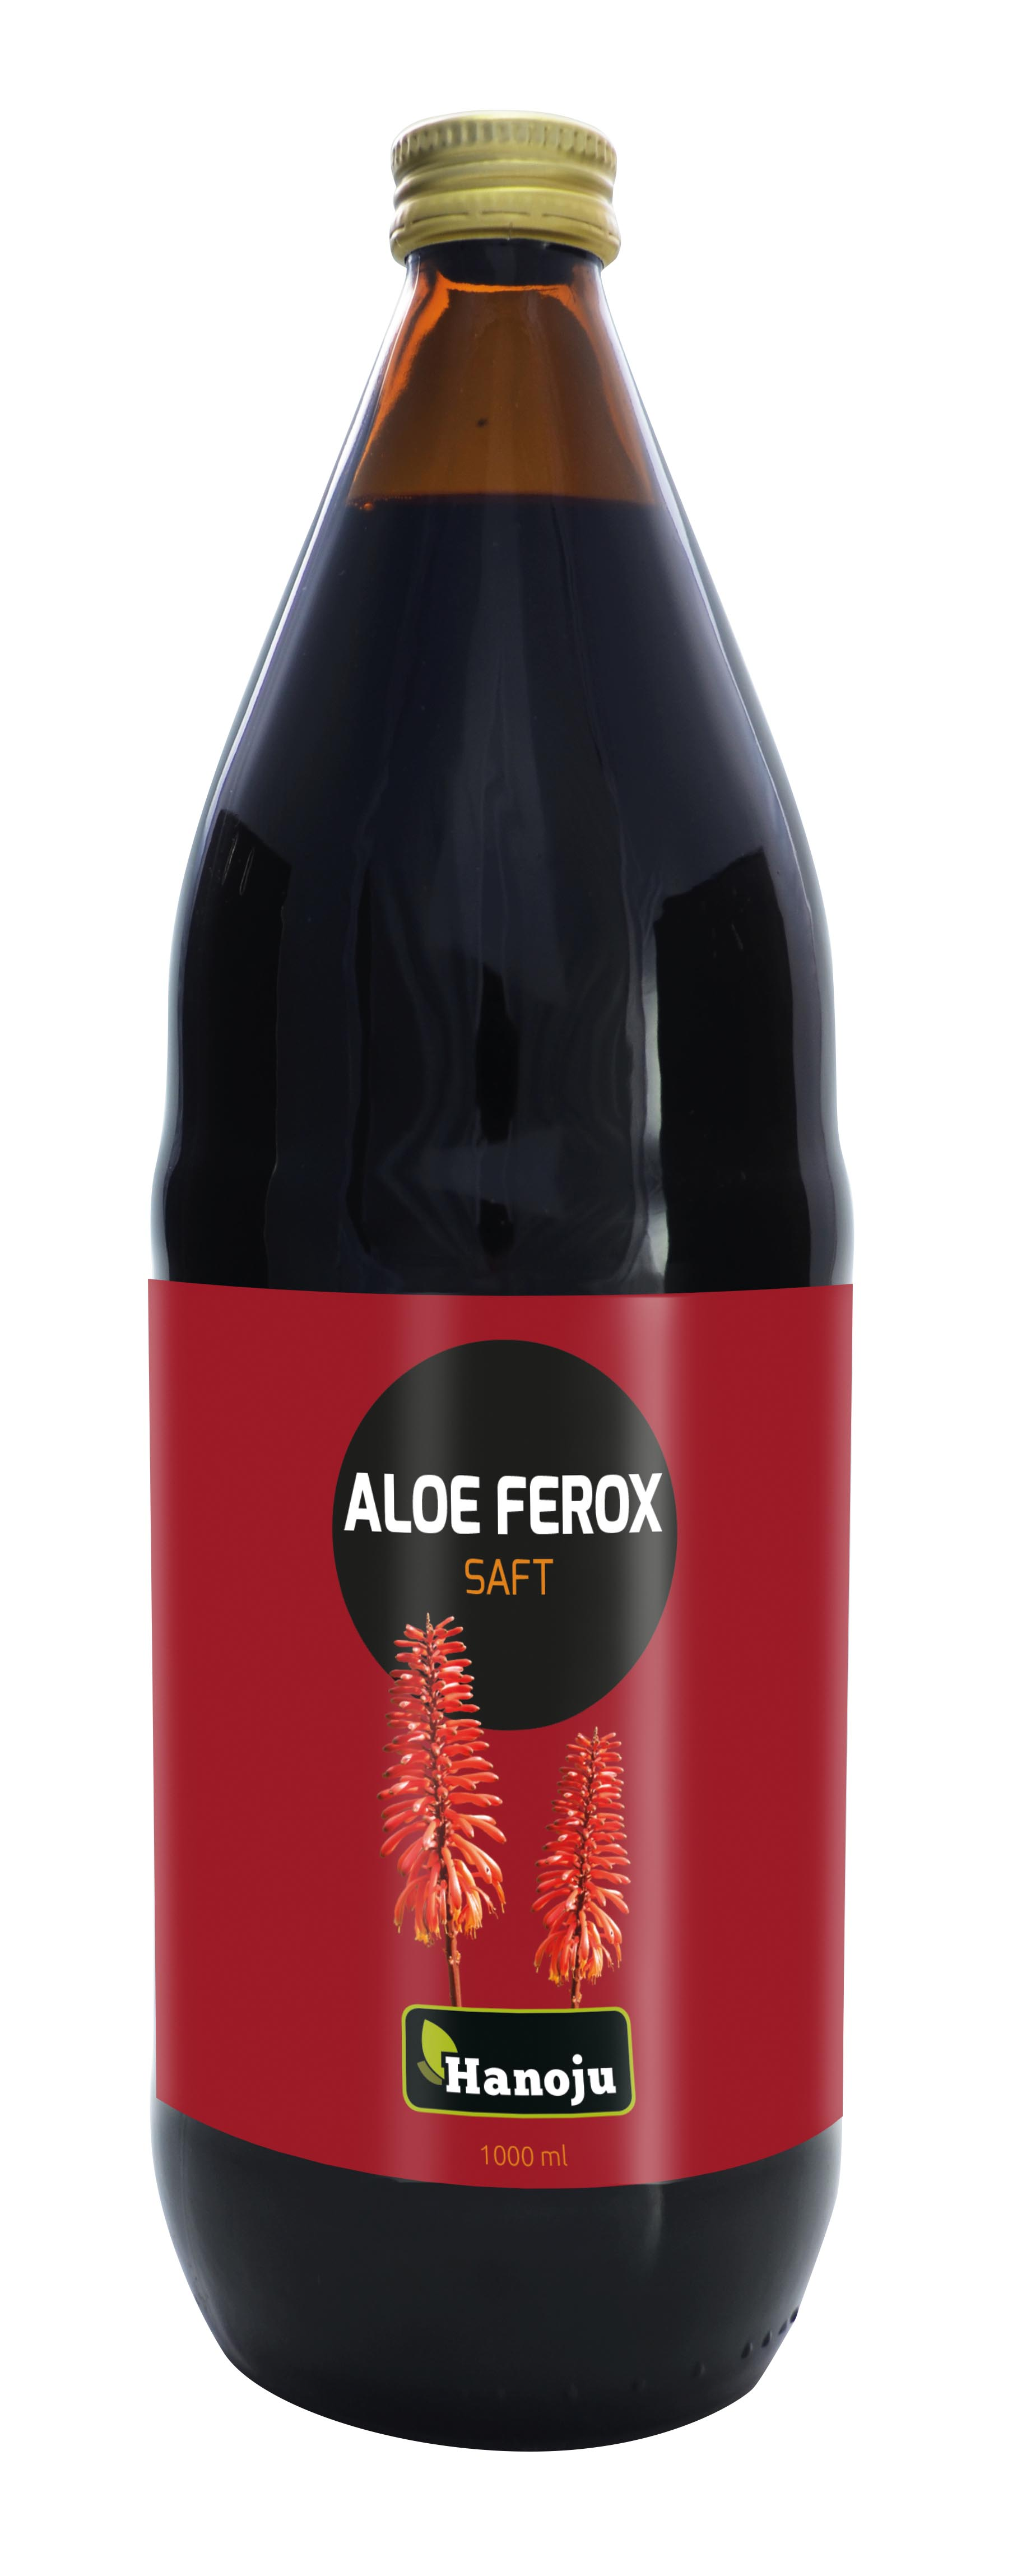 Hanoju Aloe Ferox Ganzblattsaft